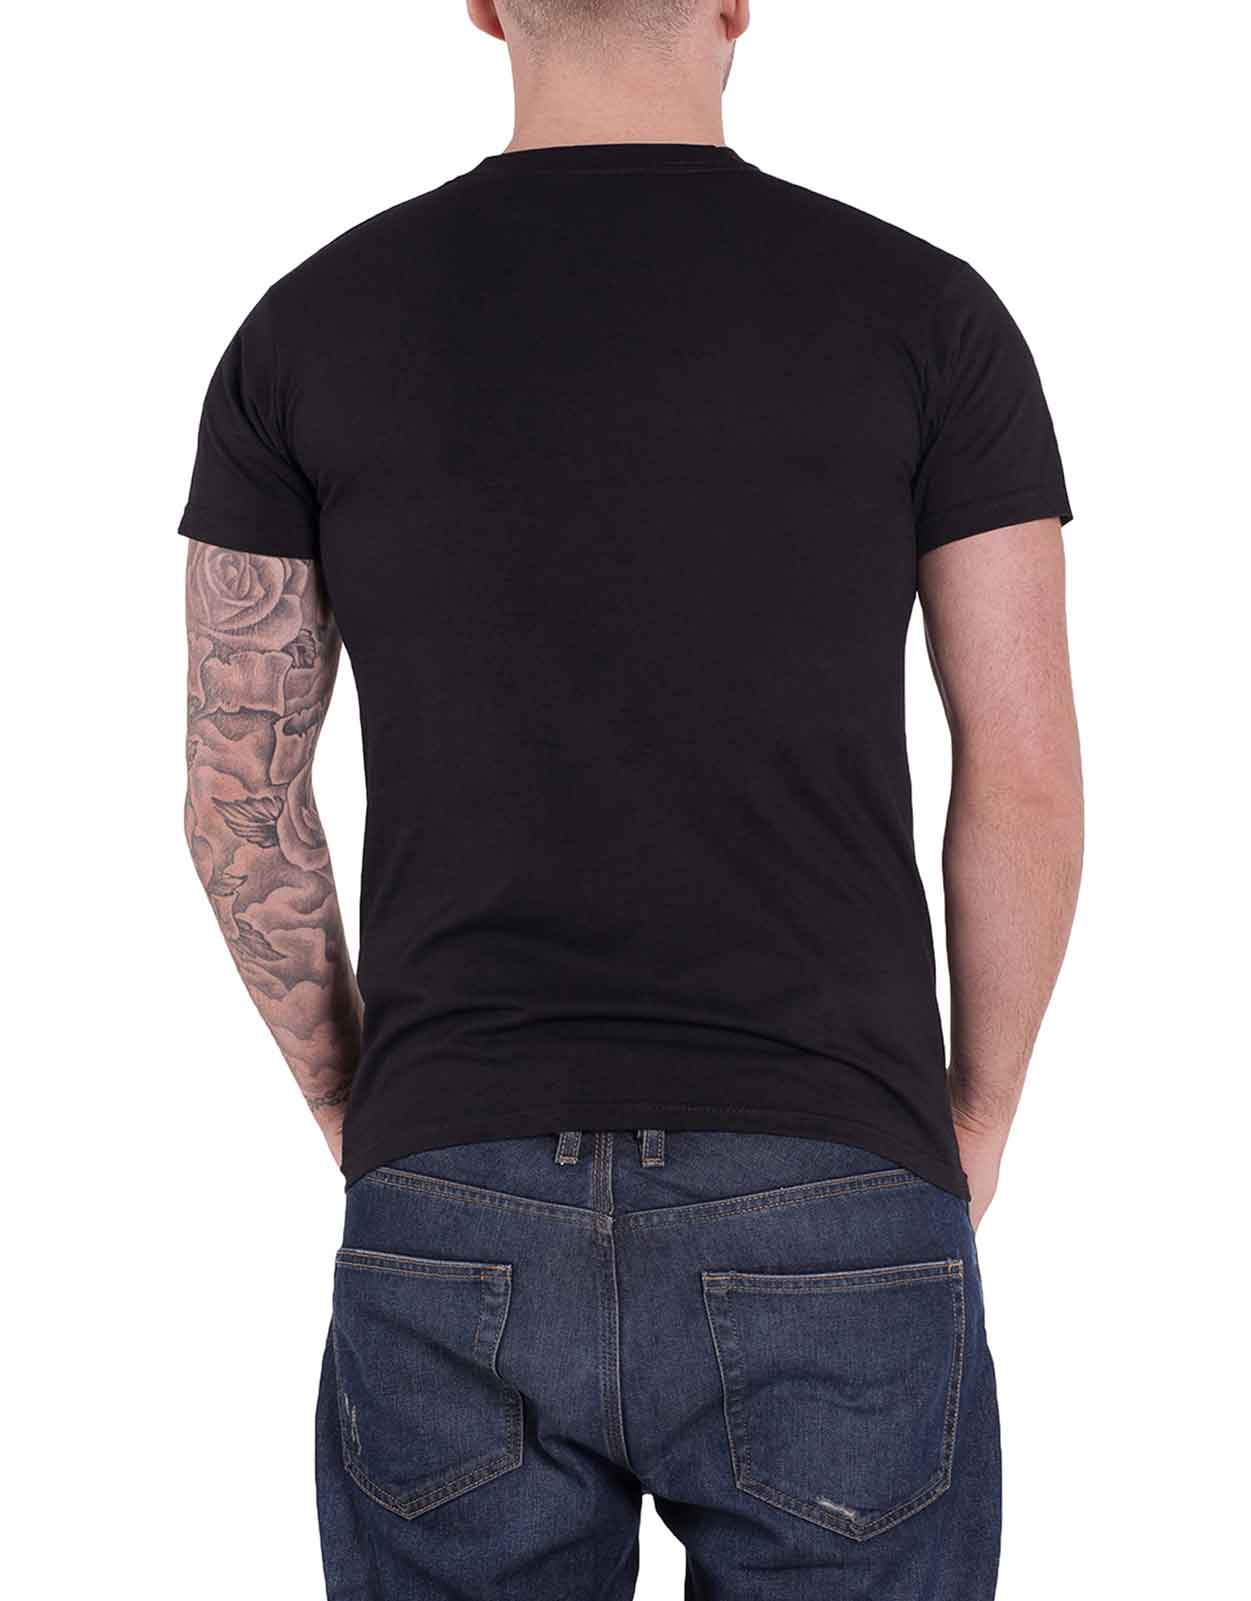 Official-Motley-Crue-T-Shirt-Shout-at-the-Devil-The-Dirt-Tour-Band-Logo-Mens thumbnail 44